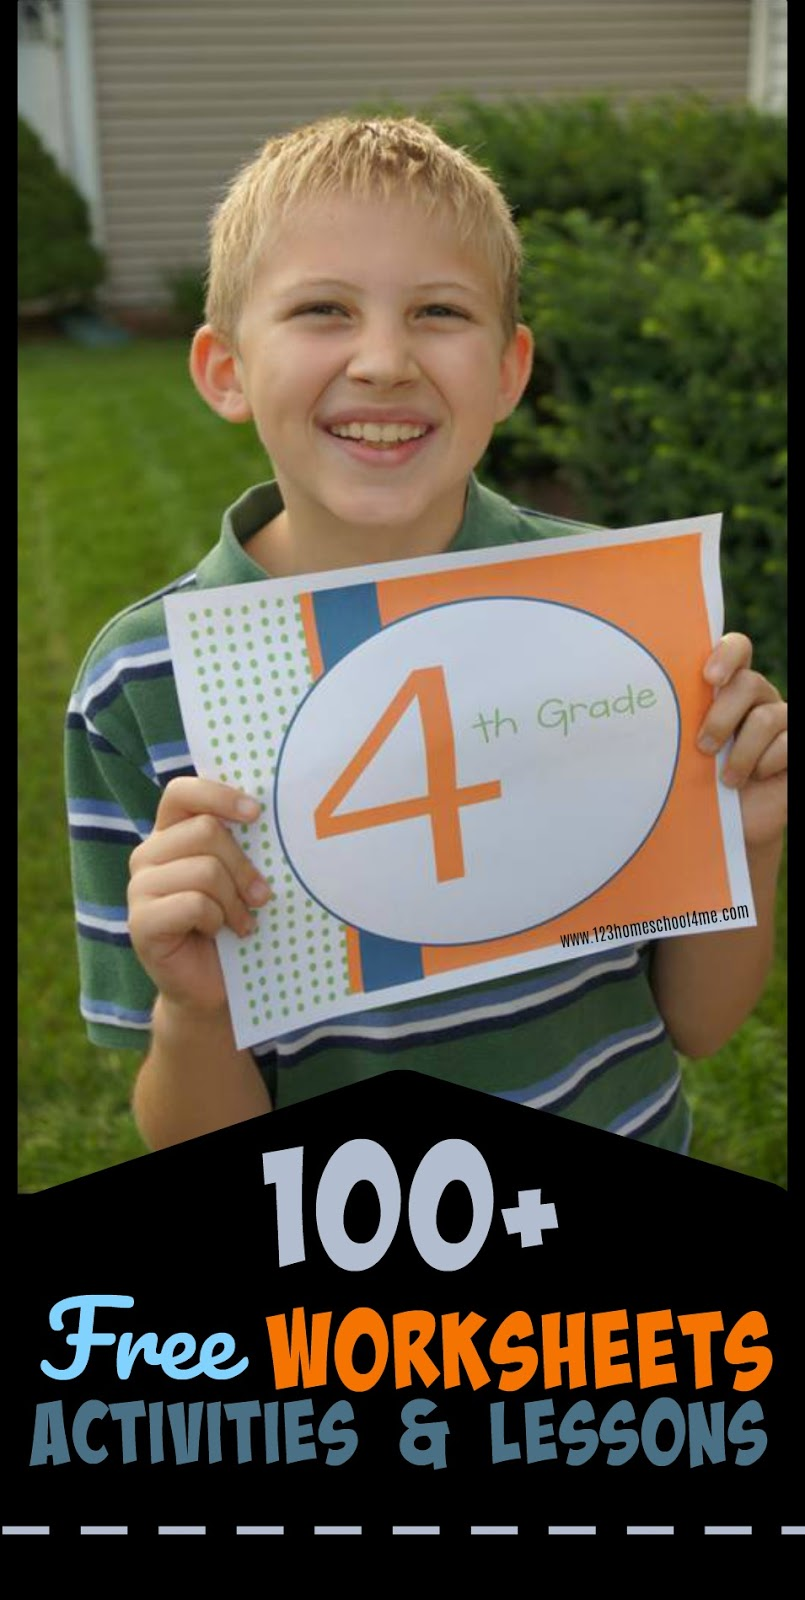 FREE 4th Grade Worksheets & Games